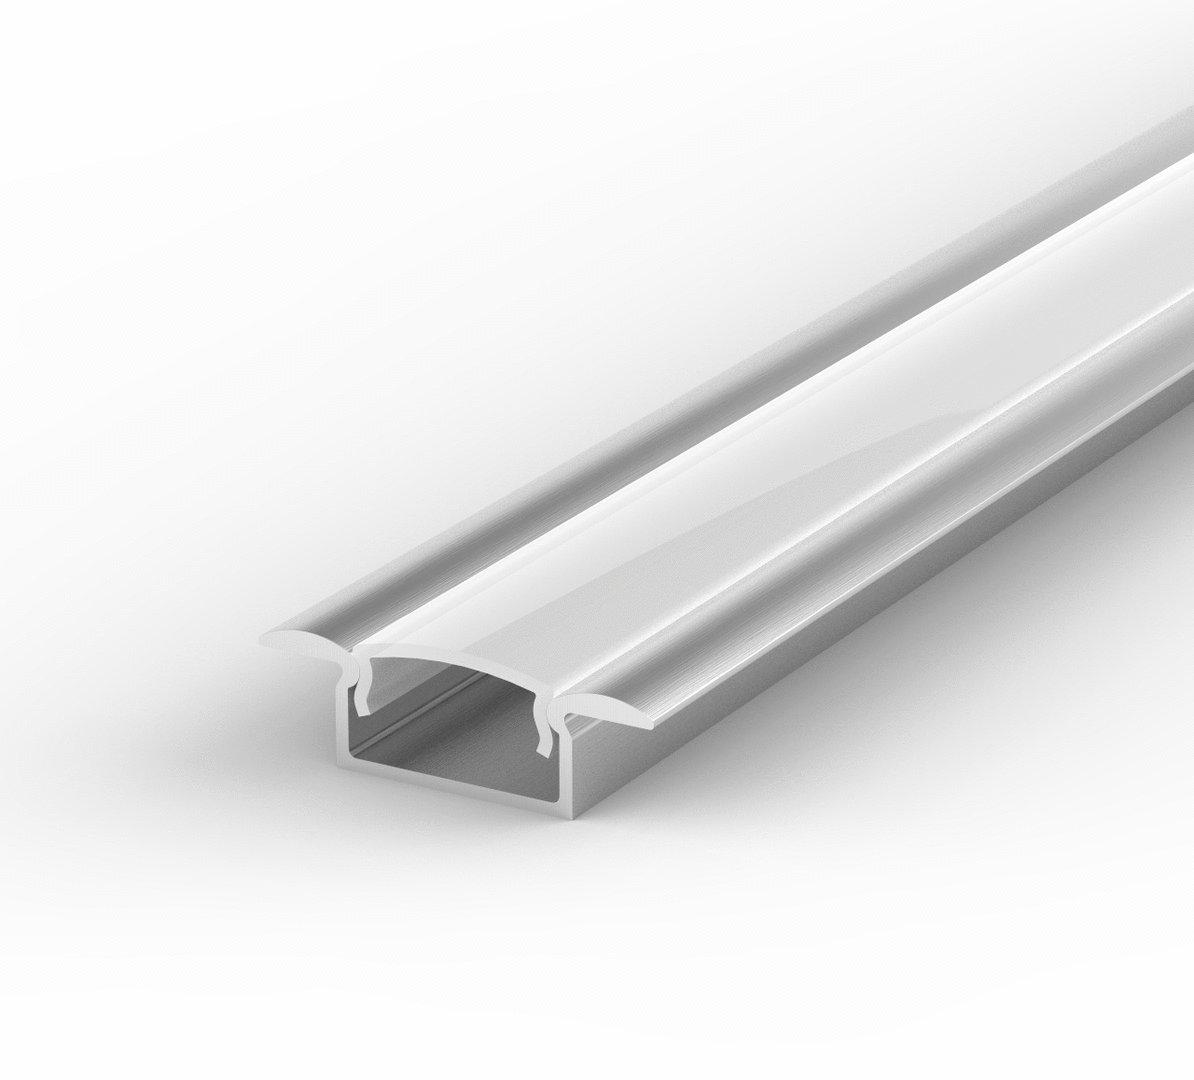 set led profil 100cm profil led f r led streifen aluminium led profil abdeckung lt6 milchig. Black Bedroom Furniture Sets. Home Design Ideas